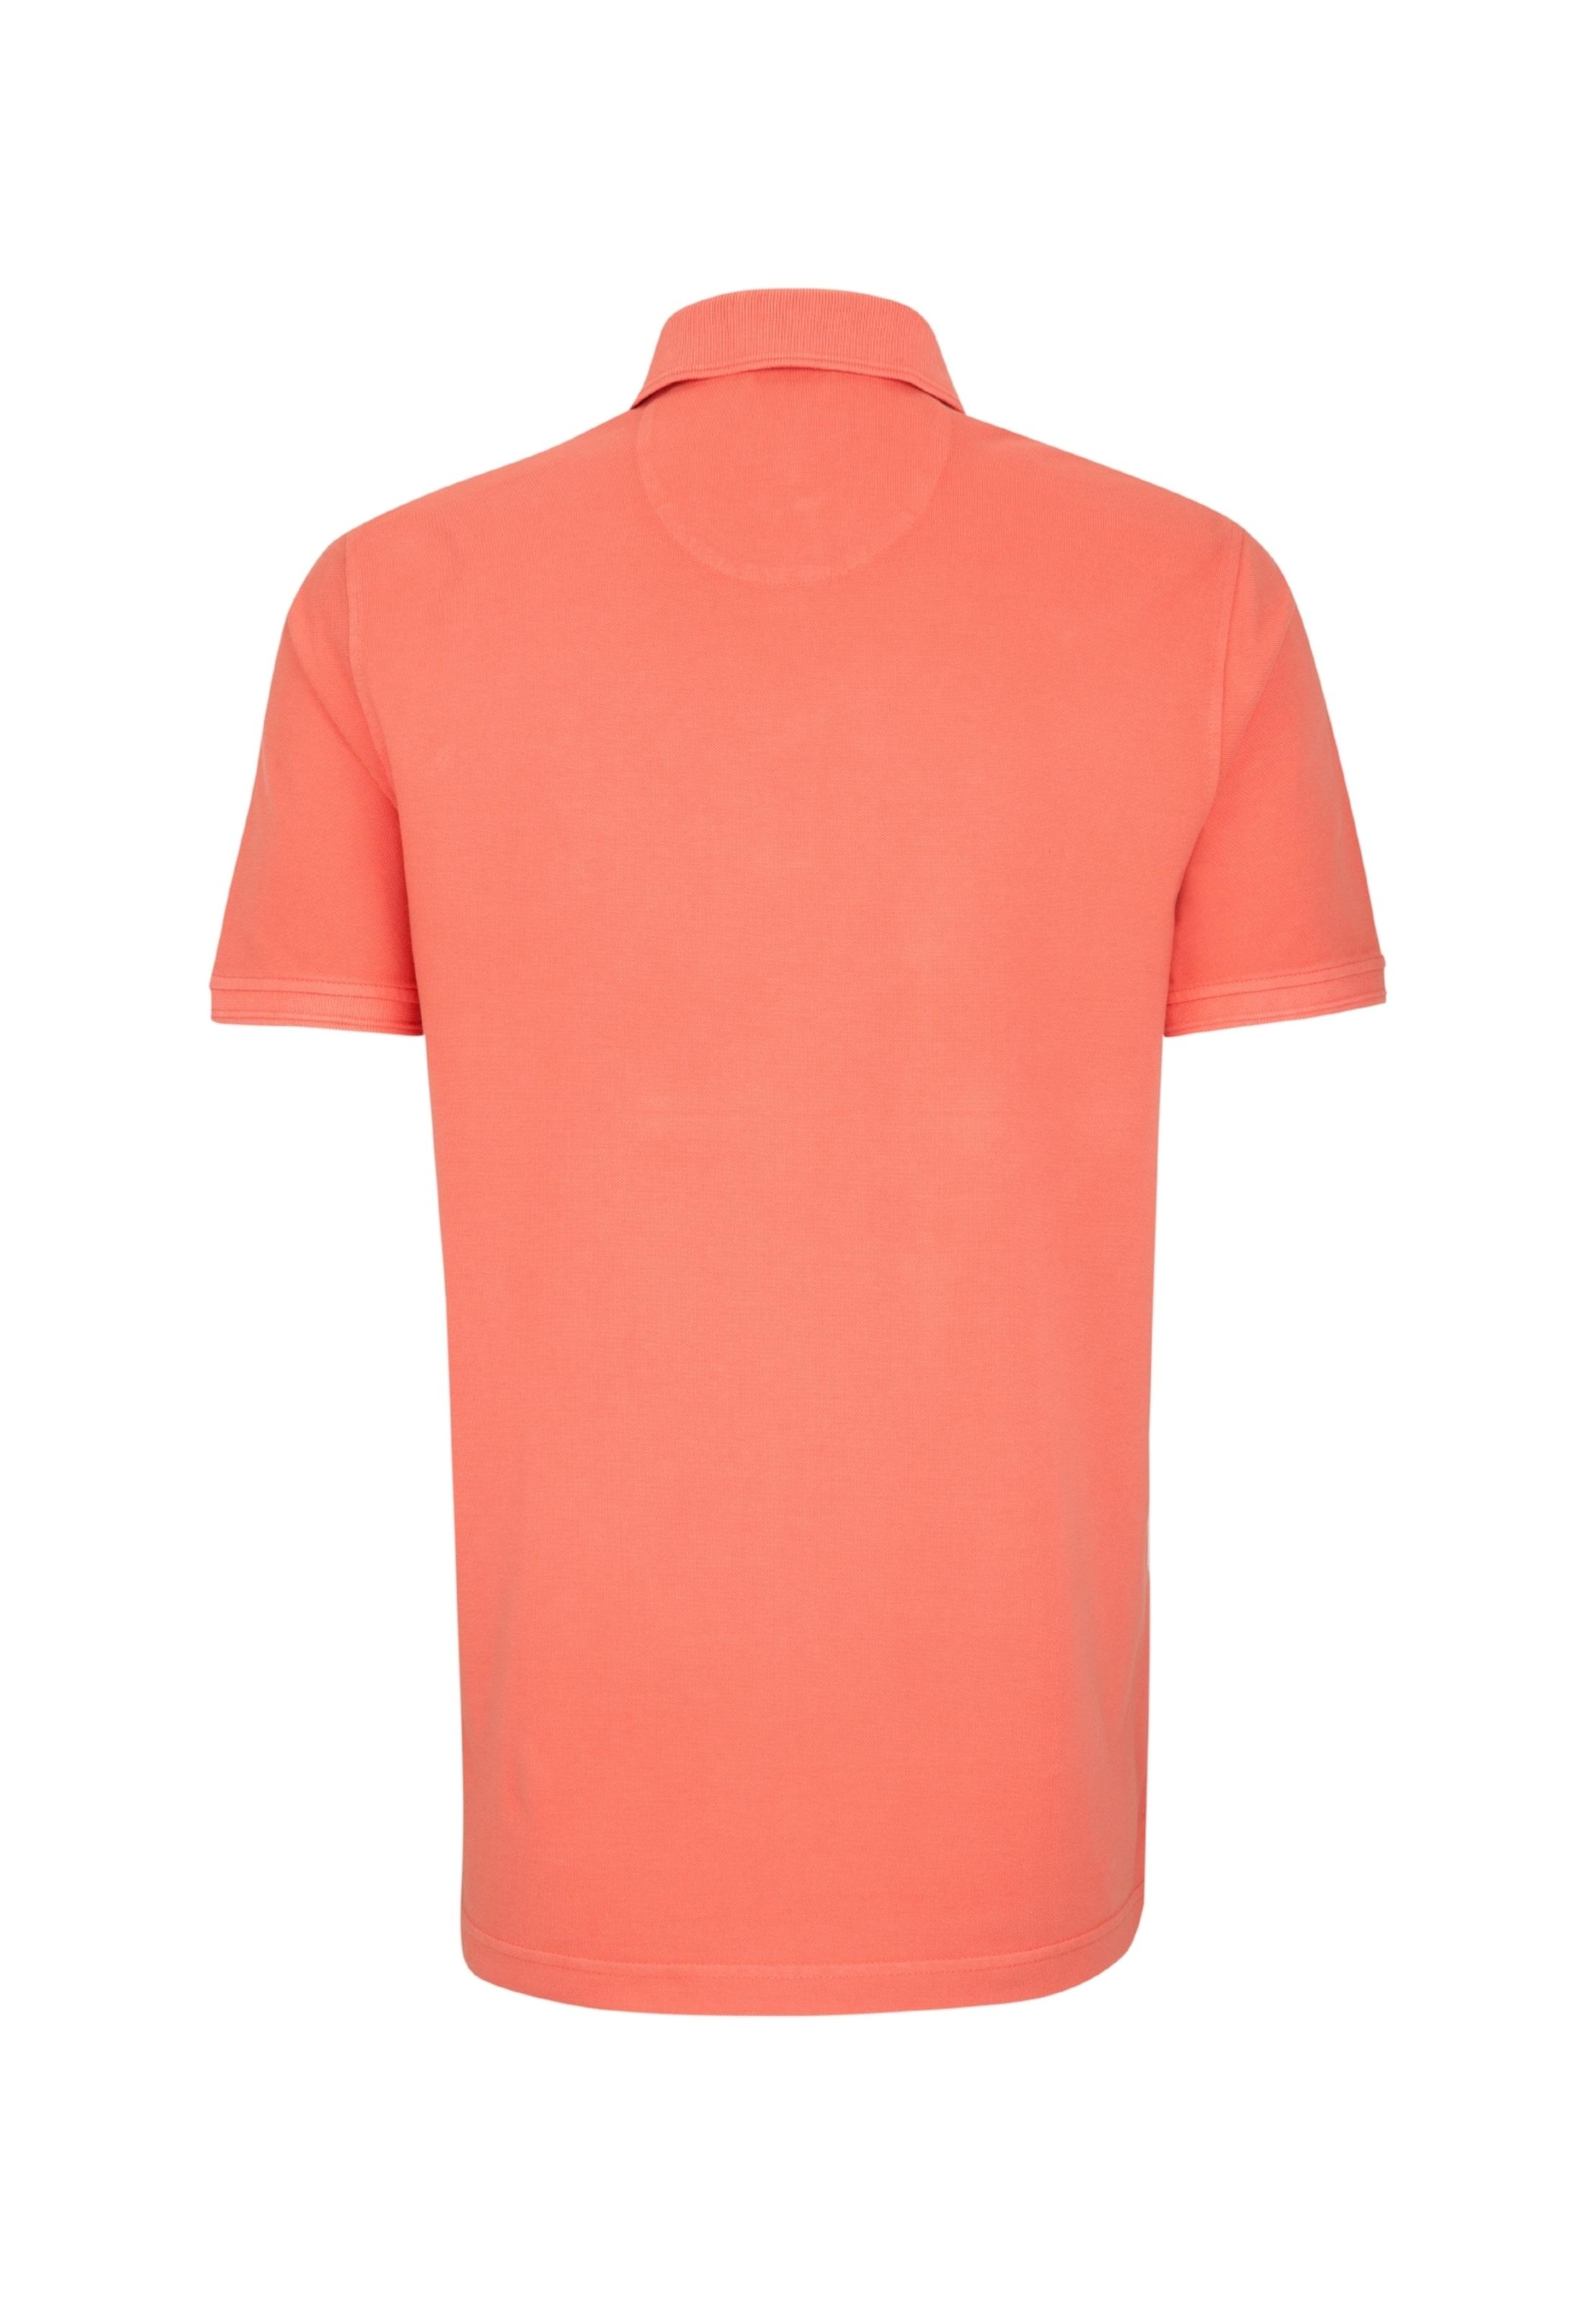 T Active Corail shirt Camel En erCBxWdo